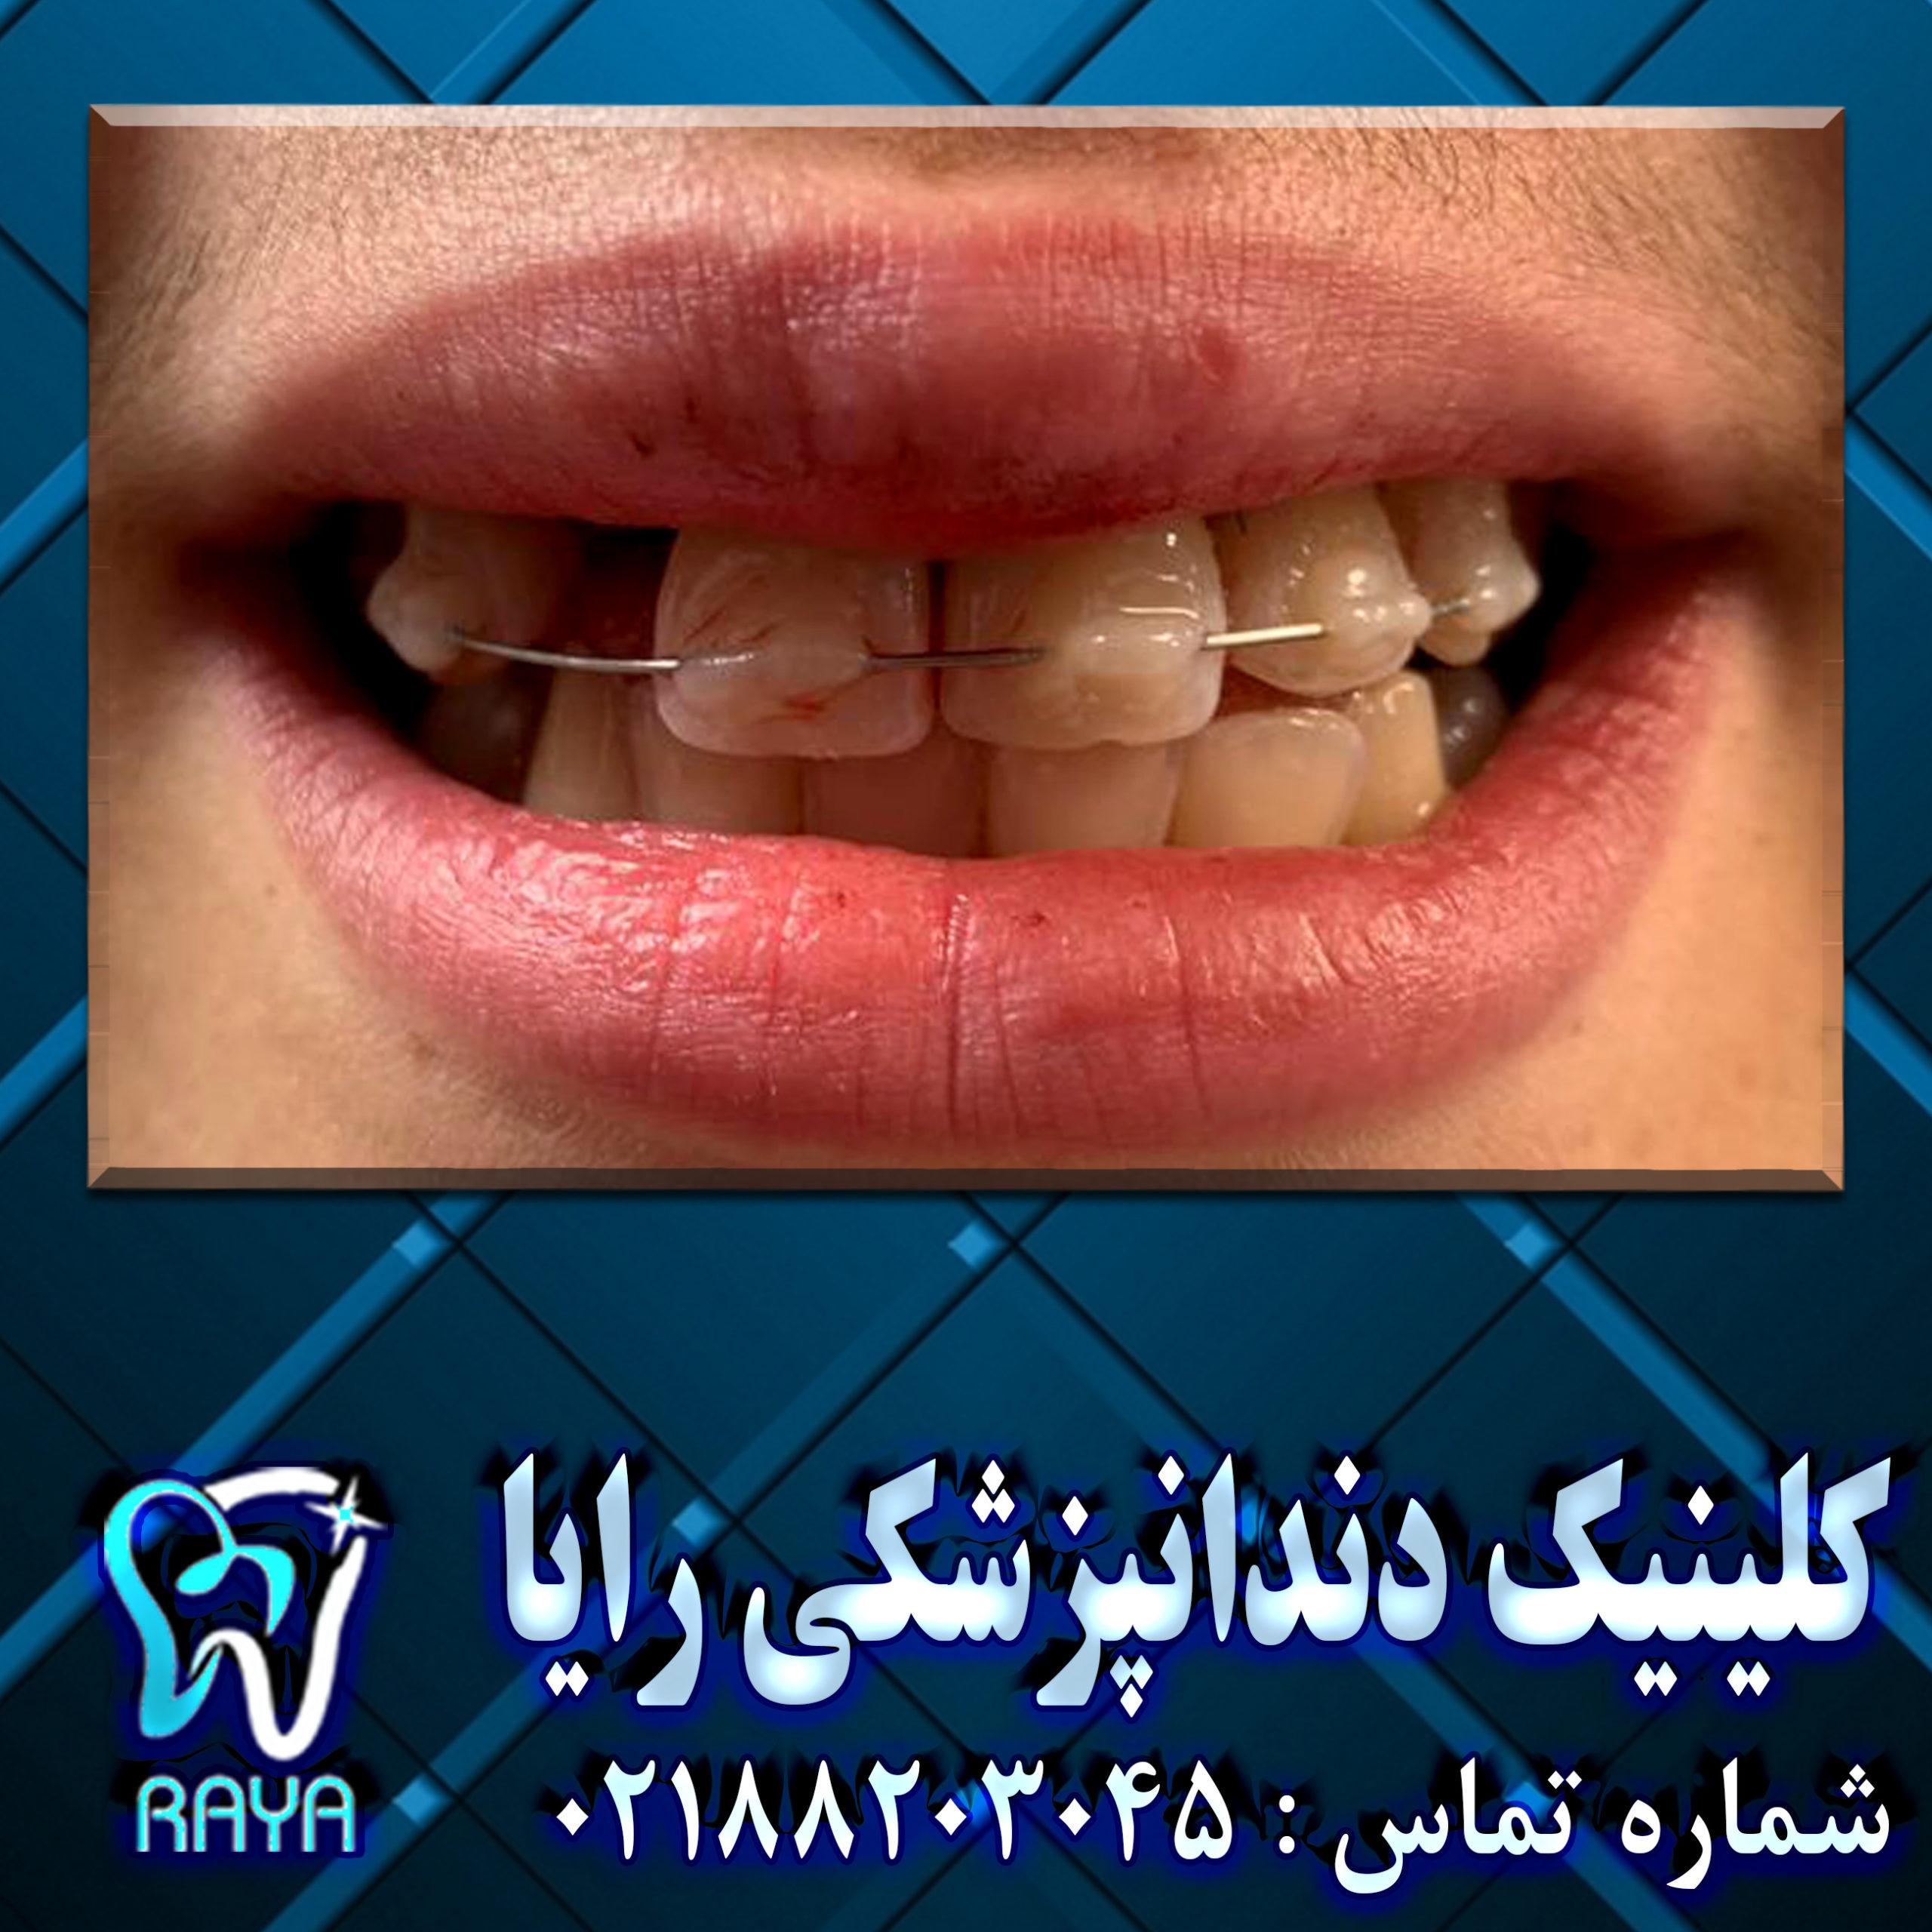 اسپلینت دندان